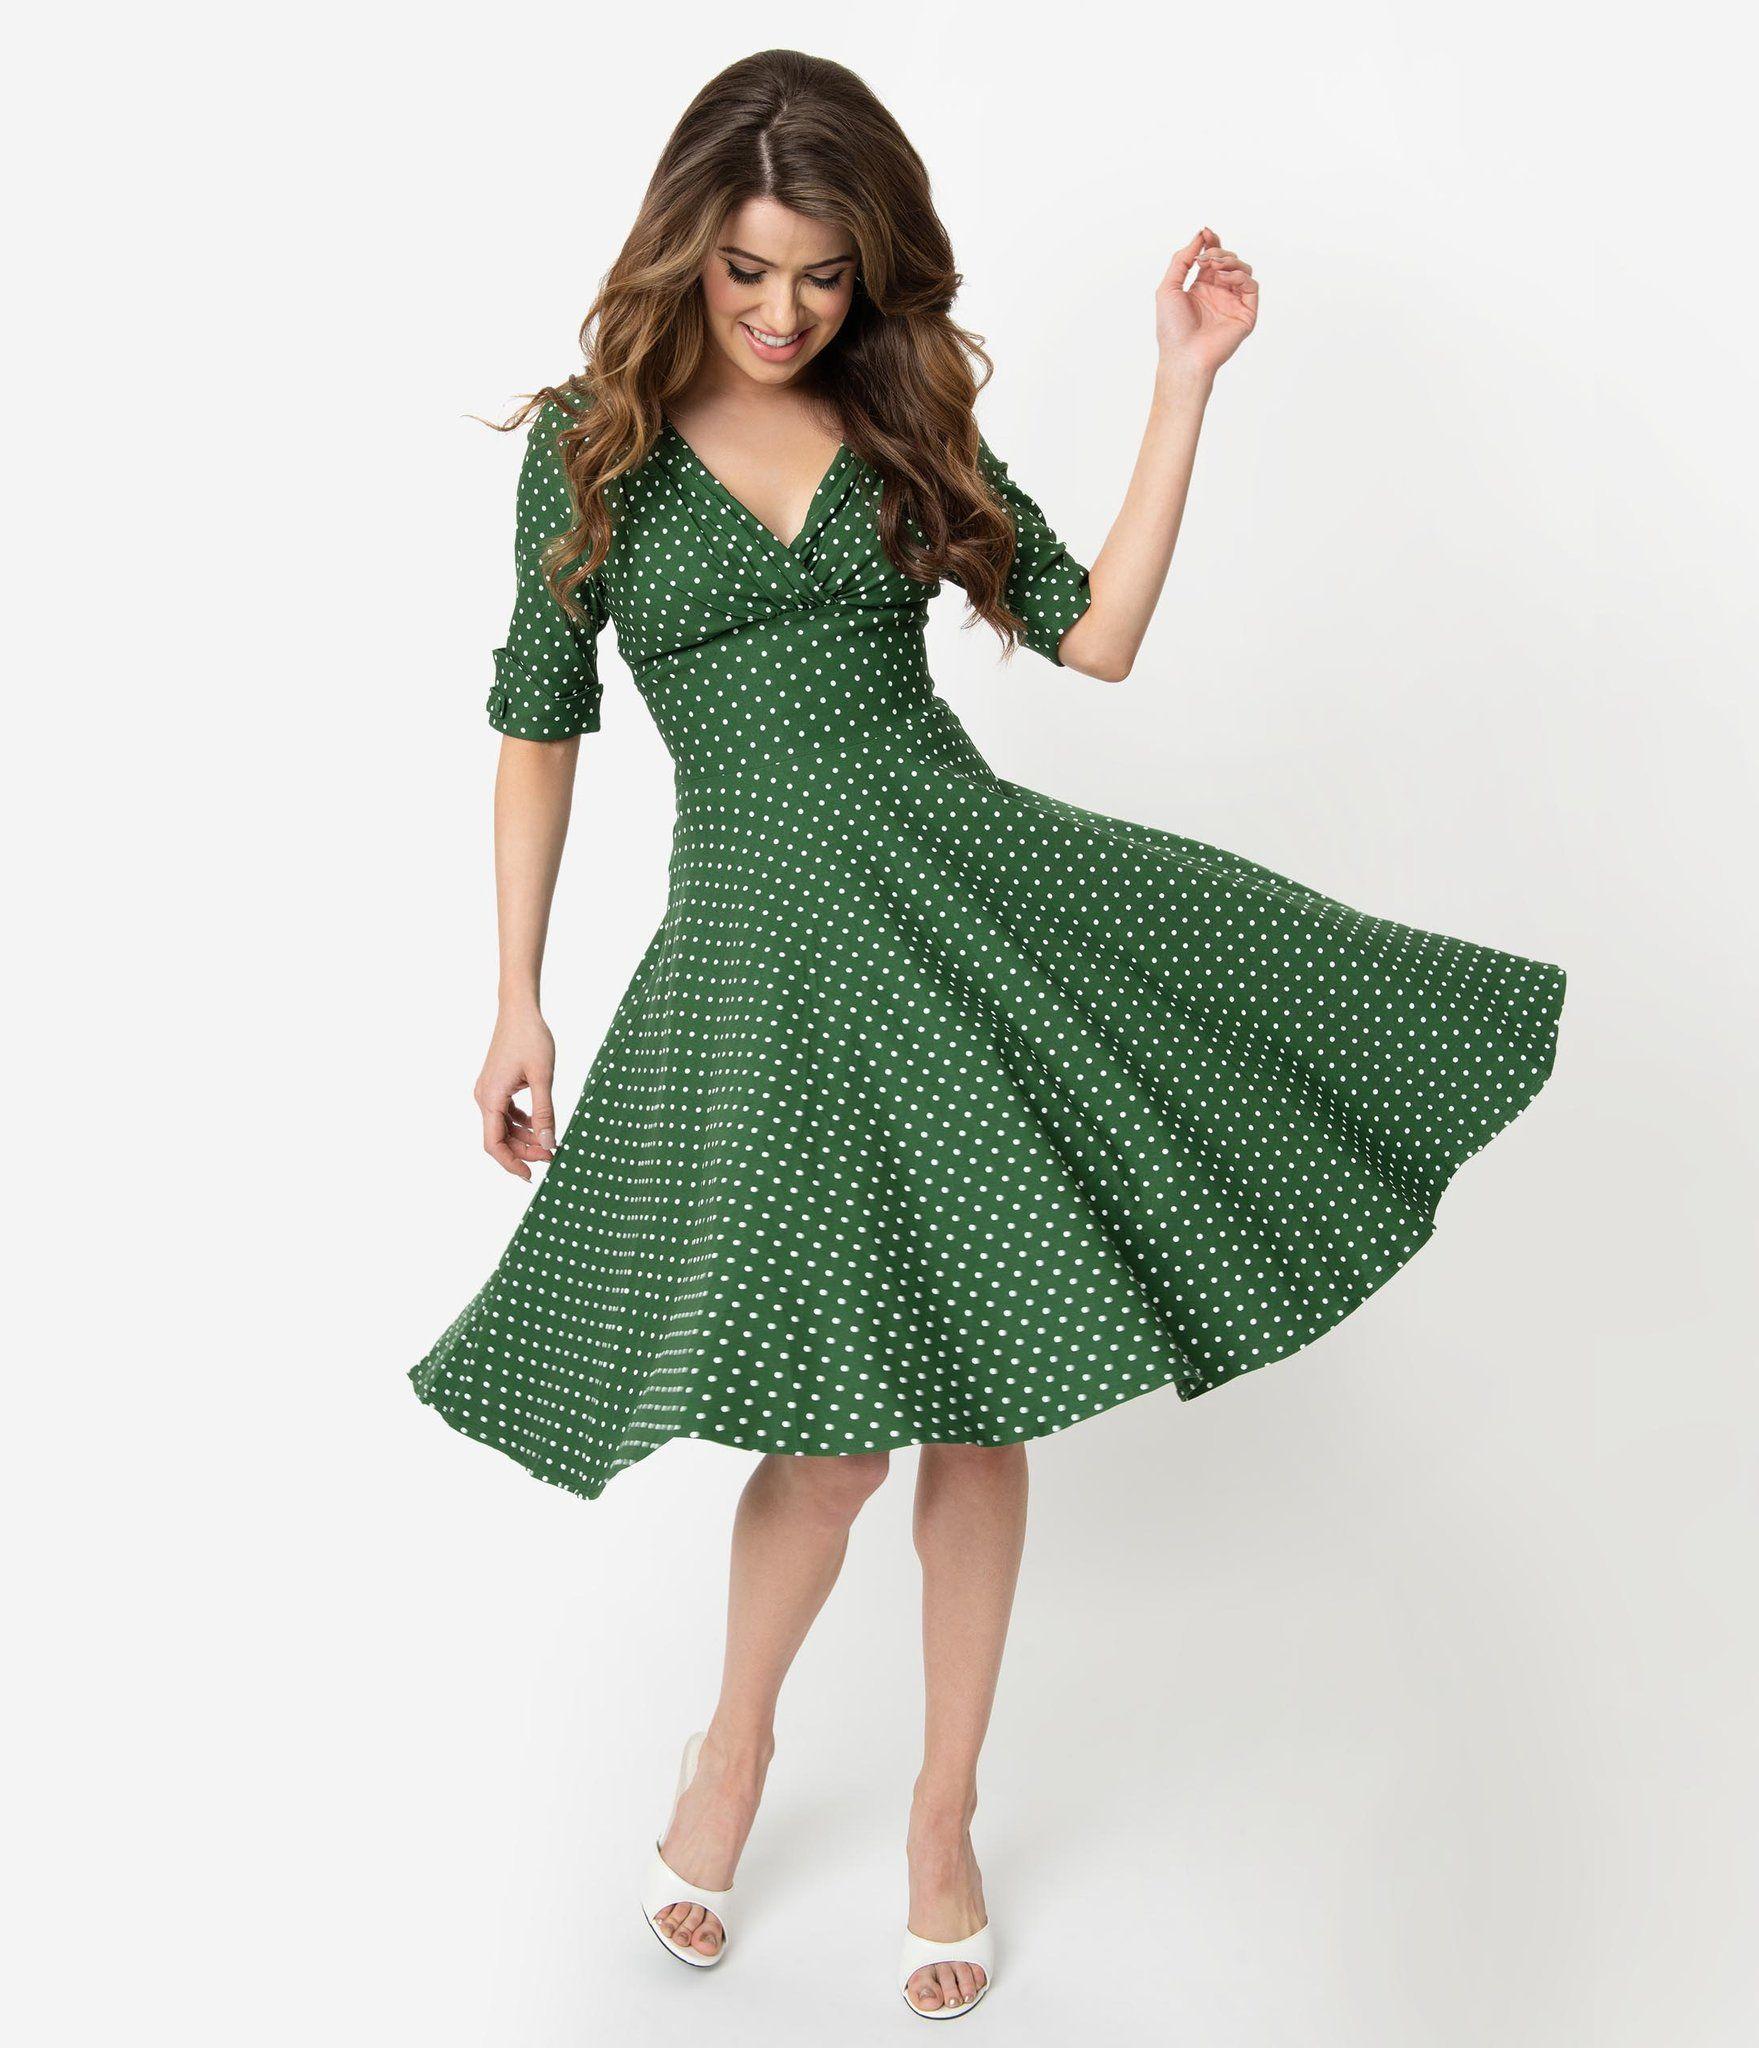 Unique Vintage 1950s Green White Pin Dot Delores Swing Dress With Sleeves Swing Dress Swing Dress With Sleeves Dresses [ 2048 x 1759 Pixel ]